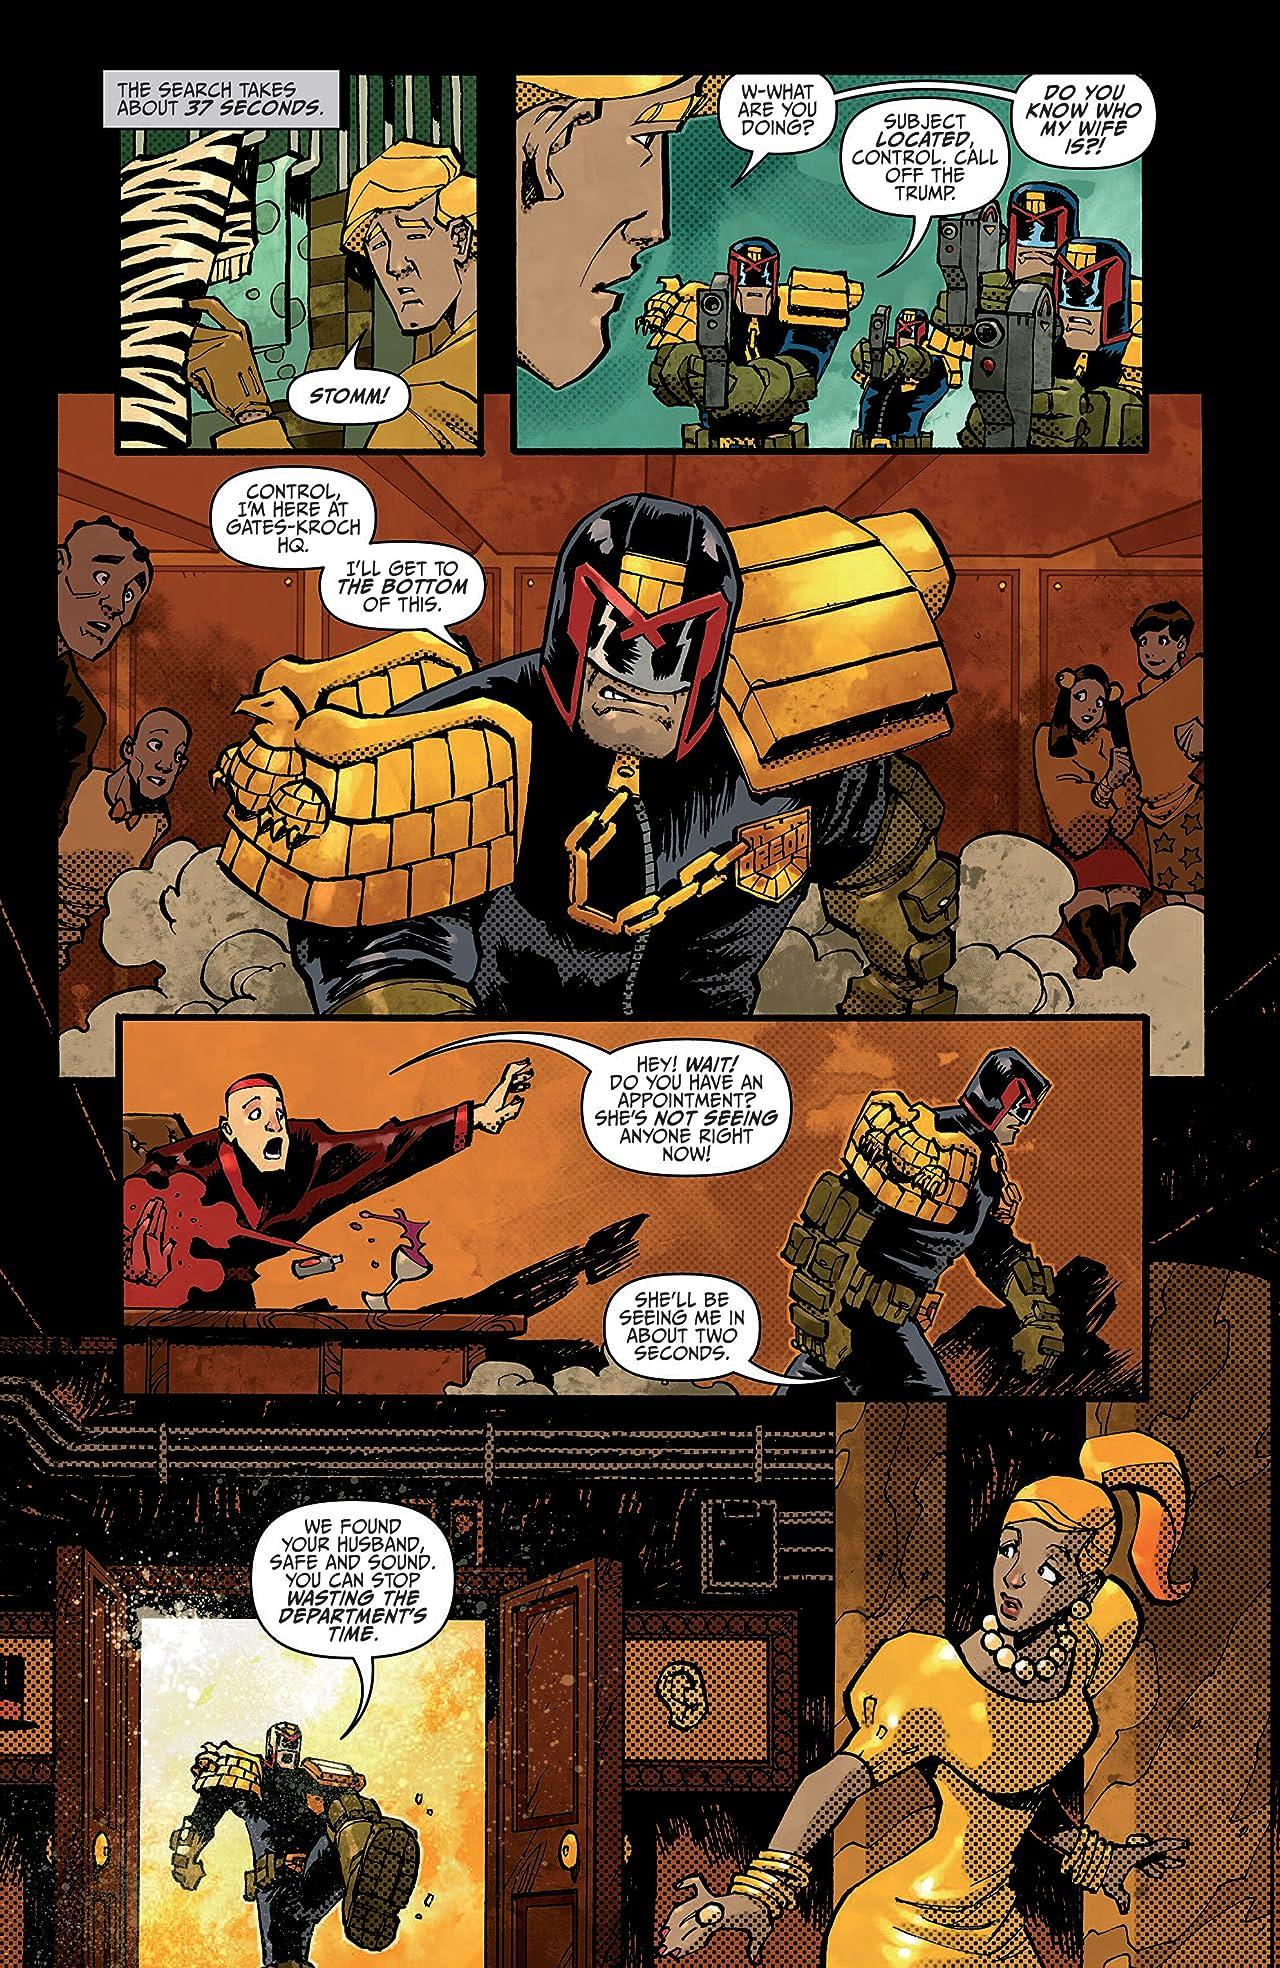 Judge Dredd #3